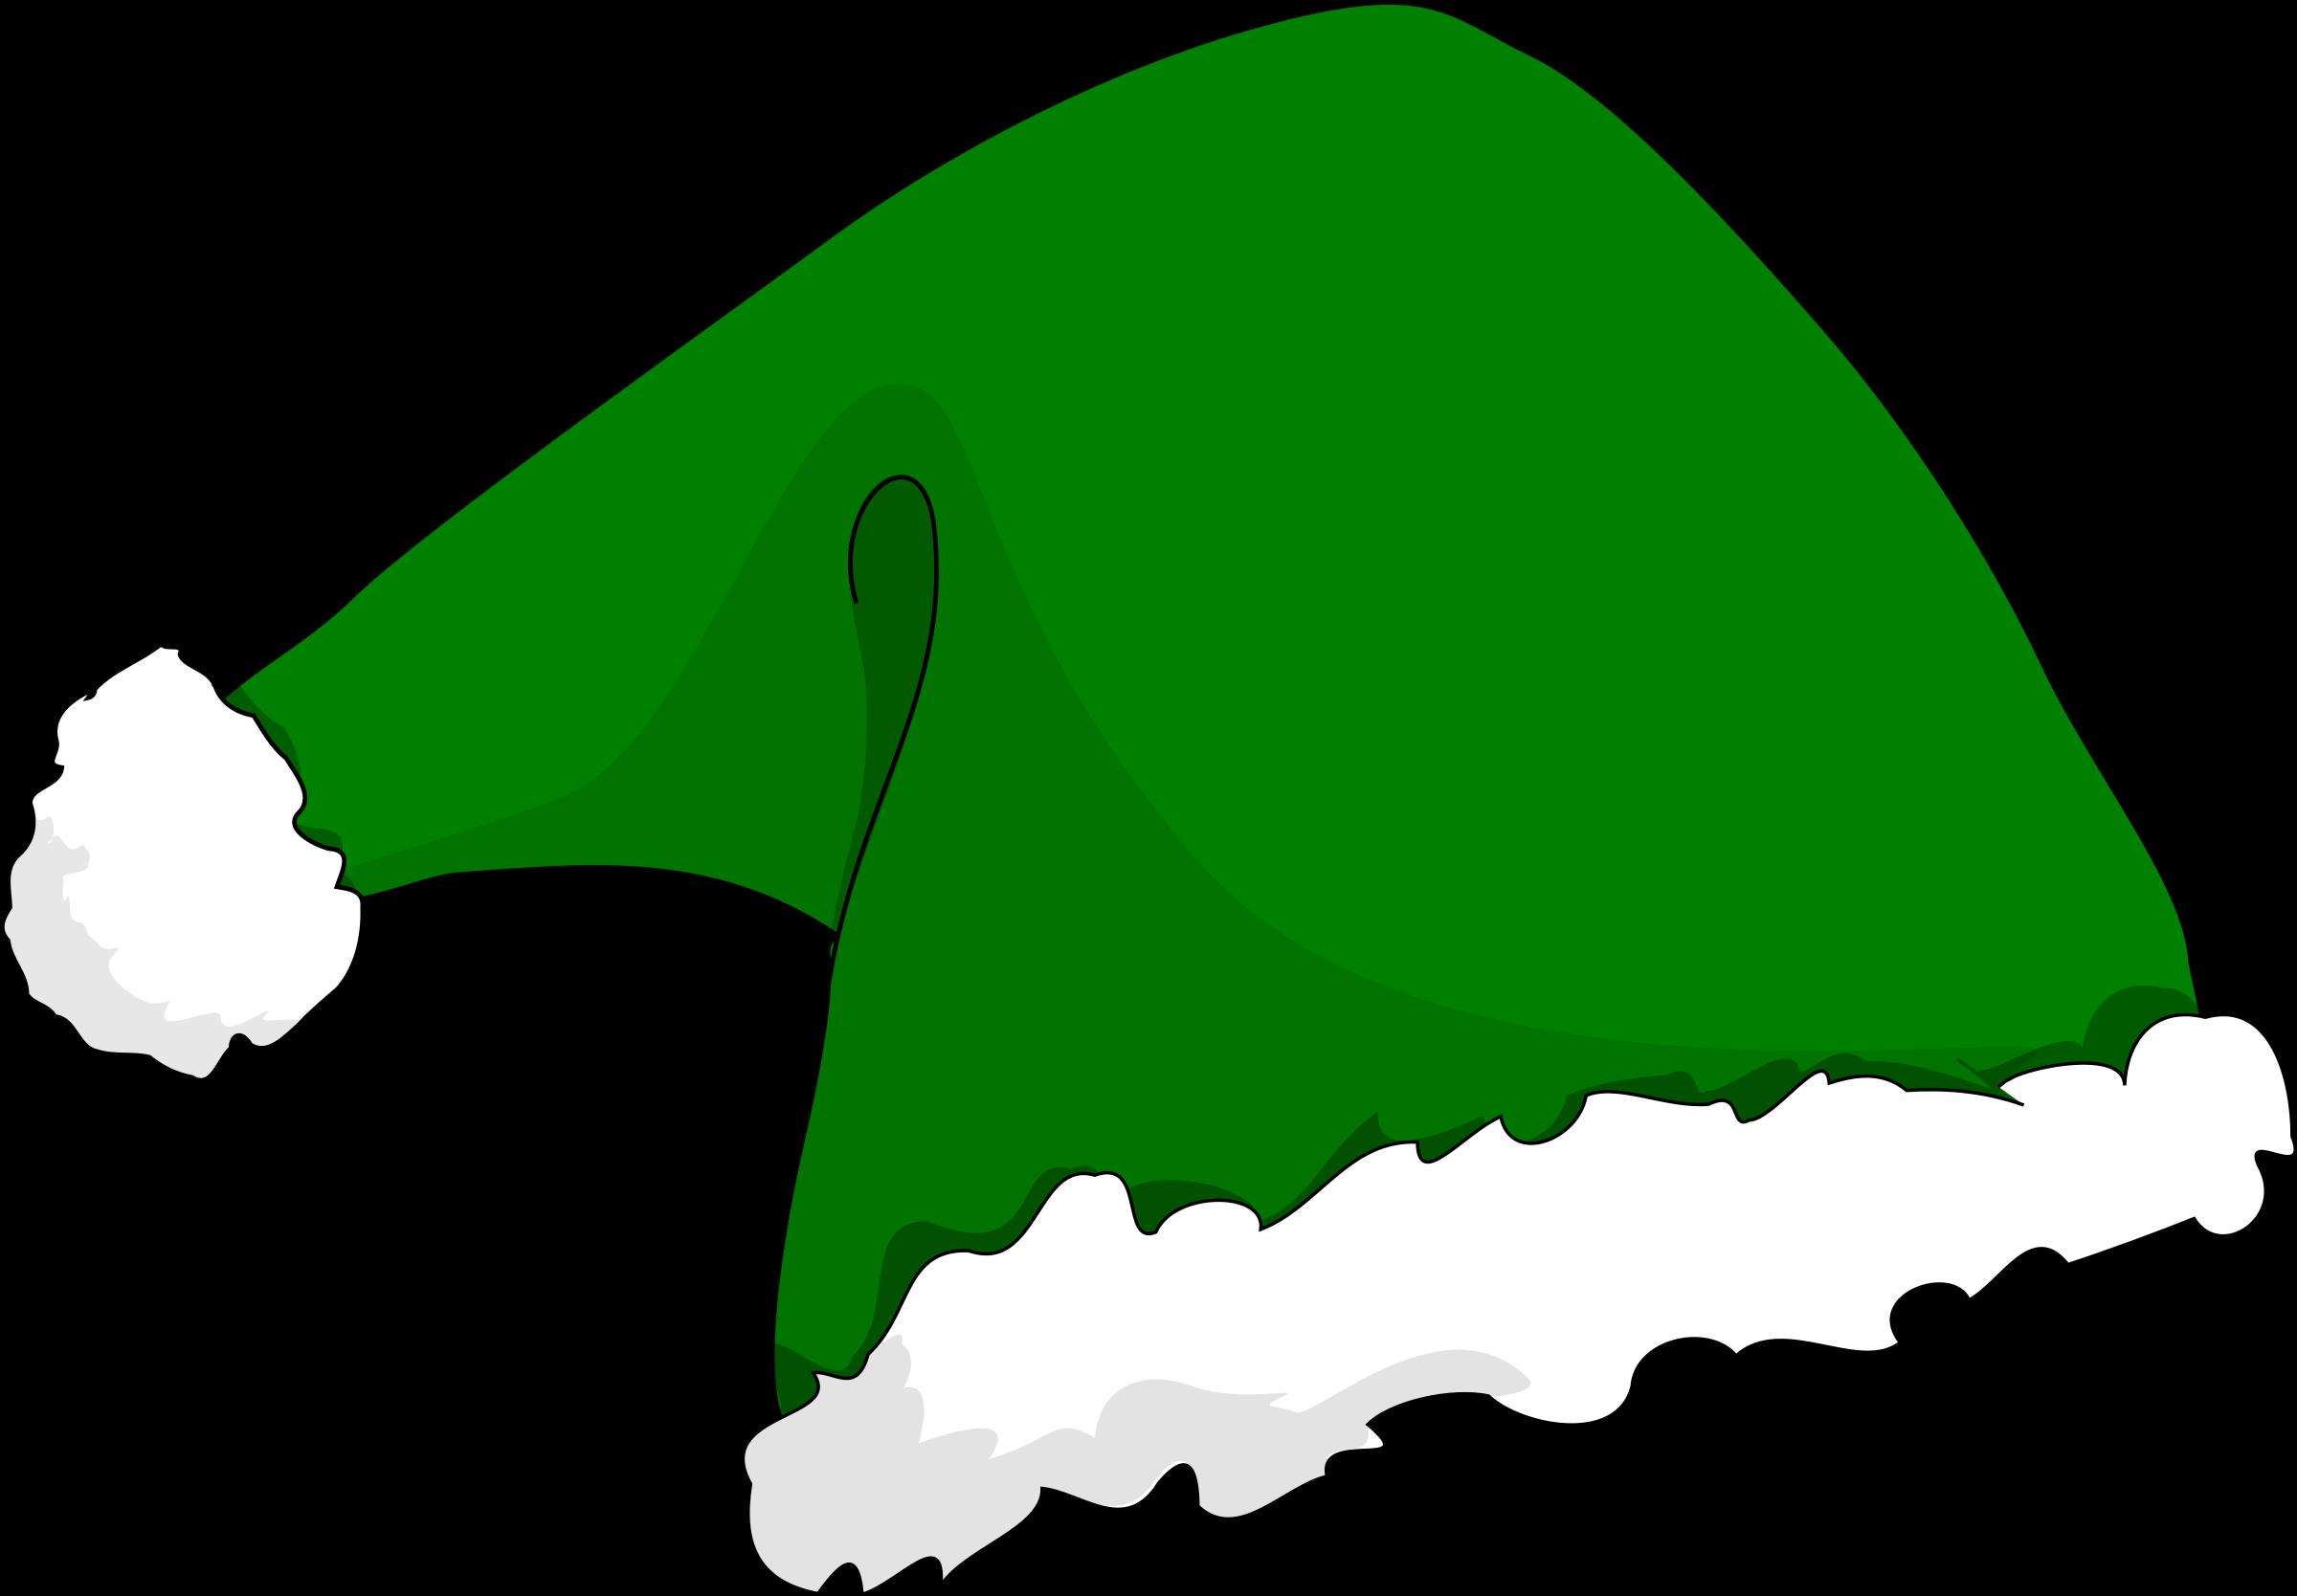 Elves clipart secret. Pointed ears elf hat